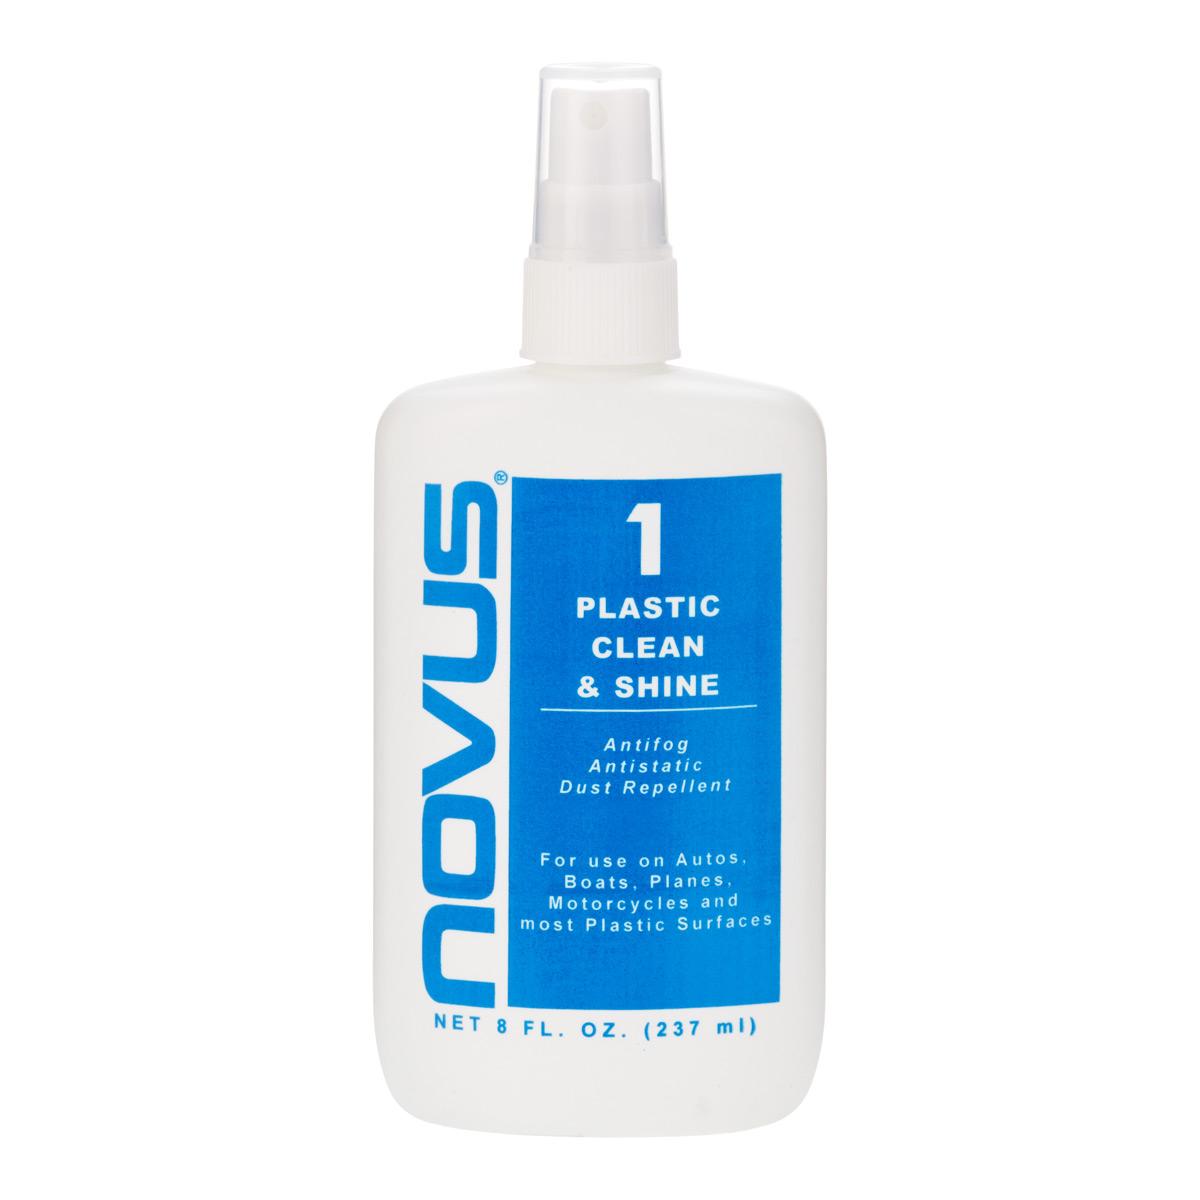 Plastic Clean & Shine #1